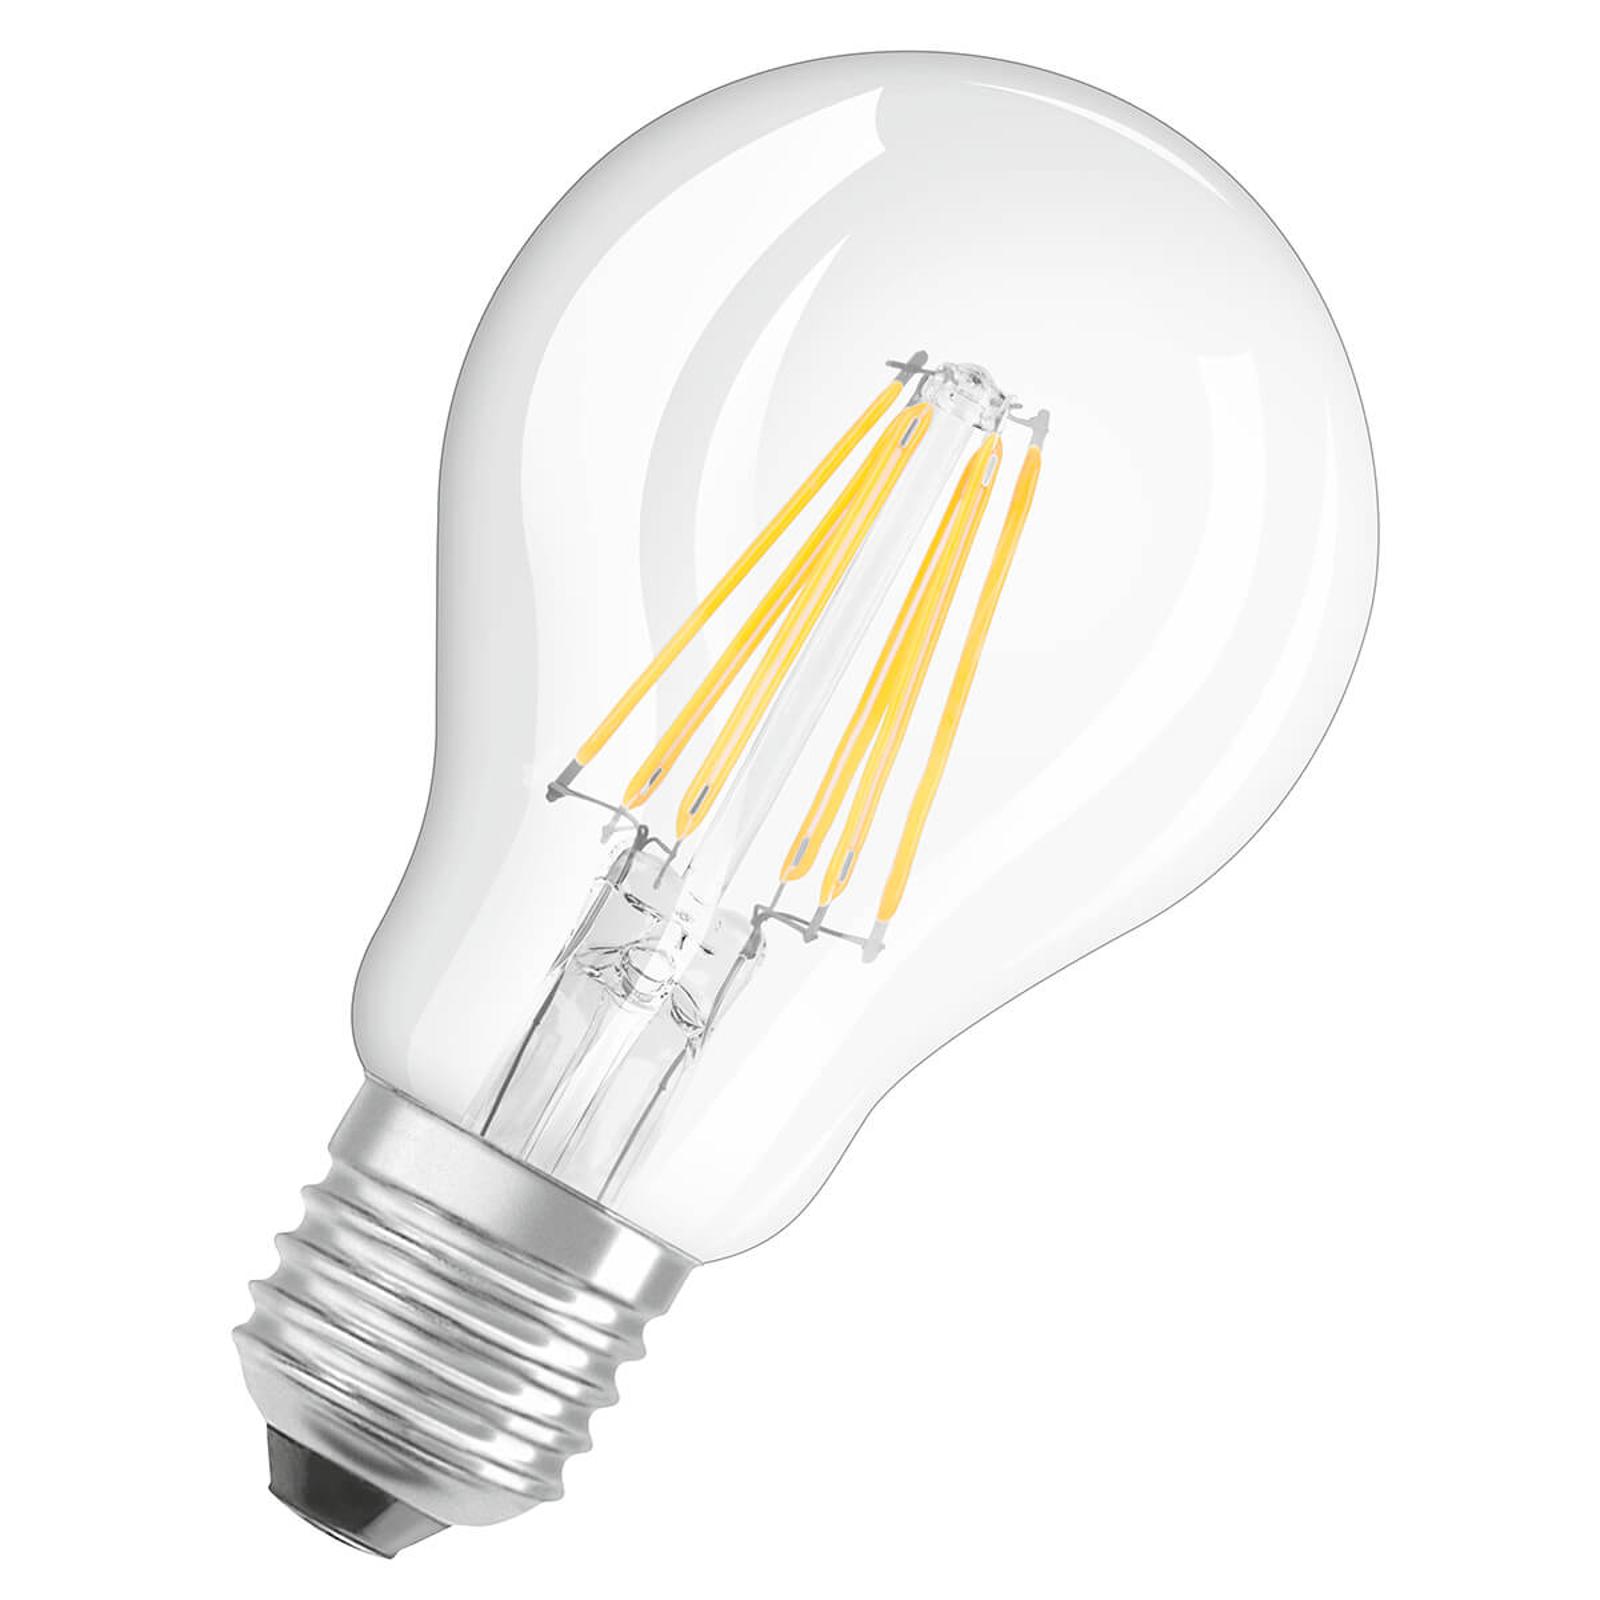 Ampoule filament LED E27 7,5W blanc chaud dimmable